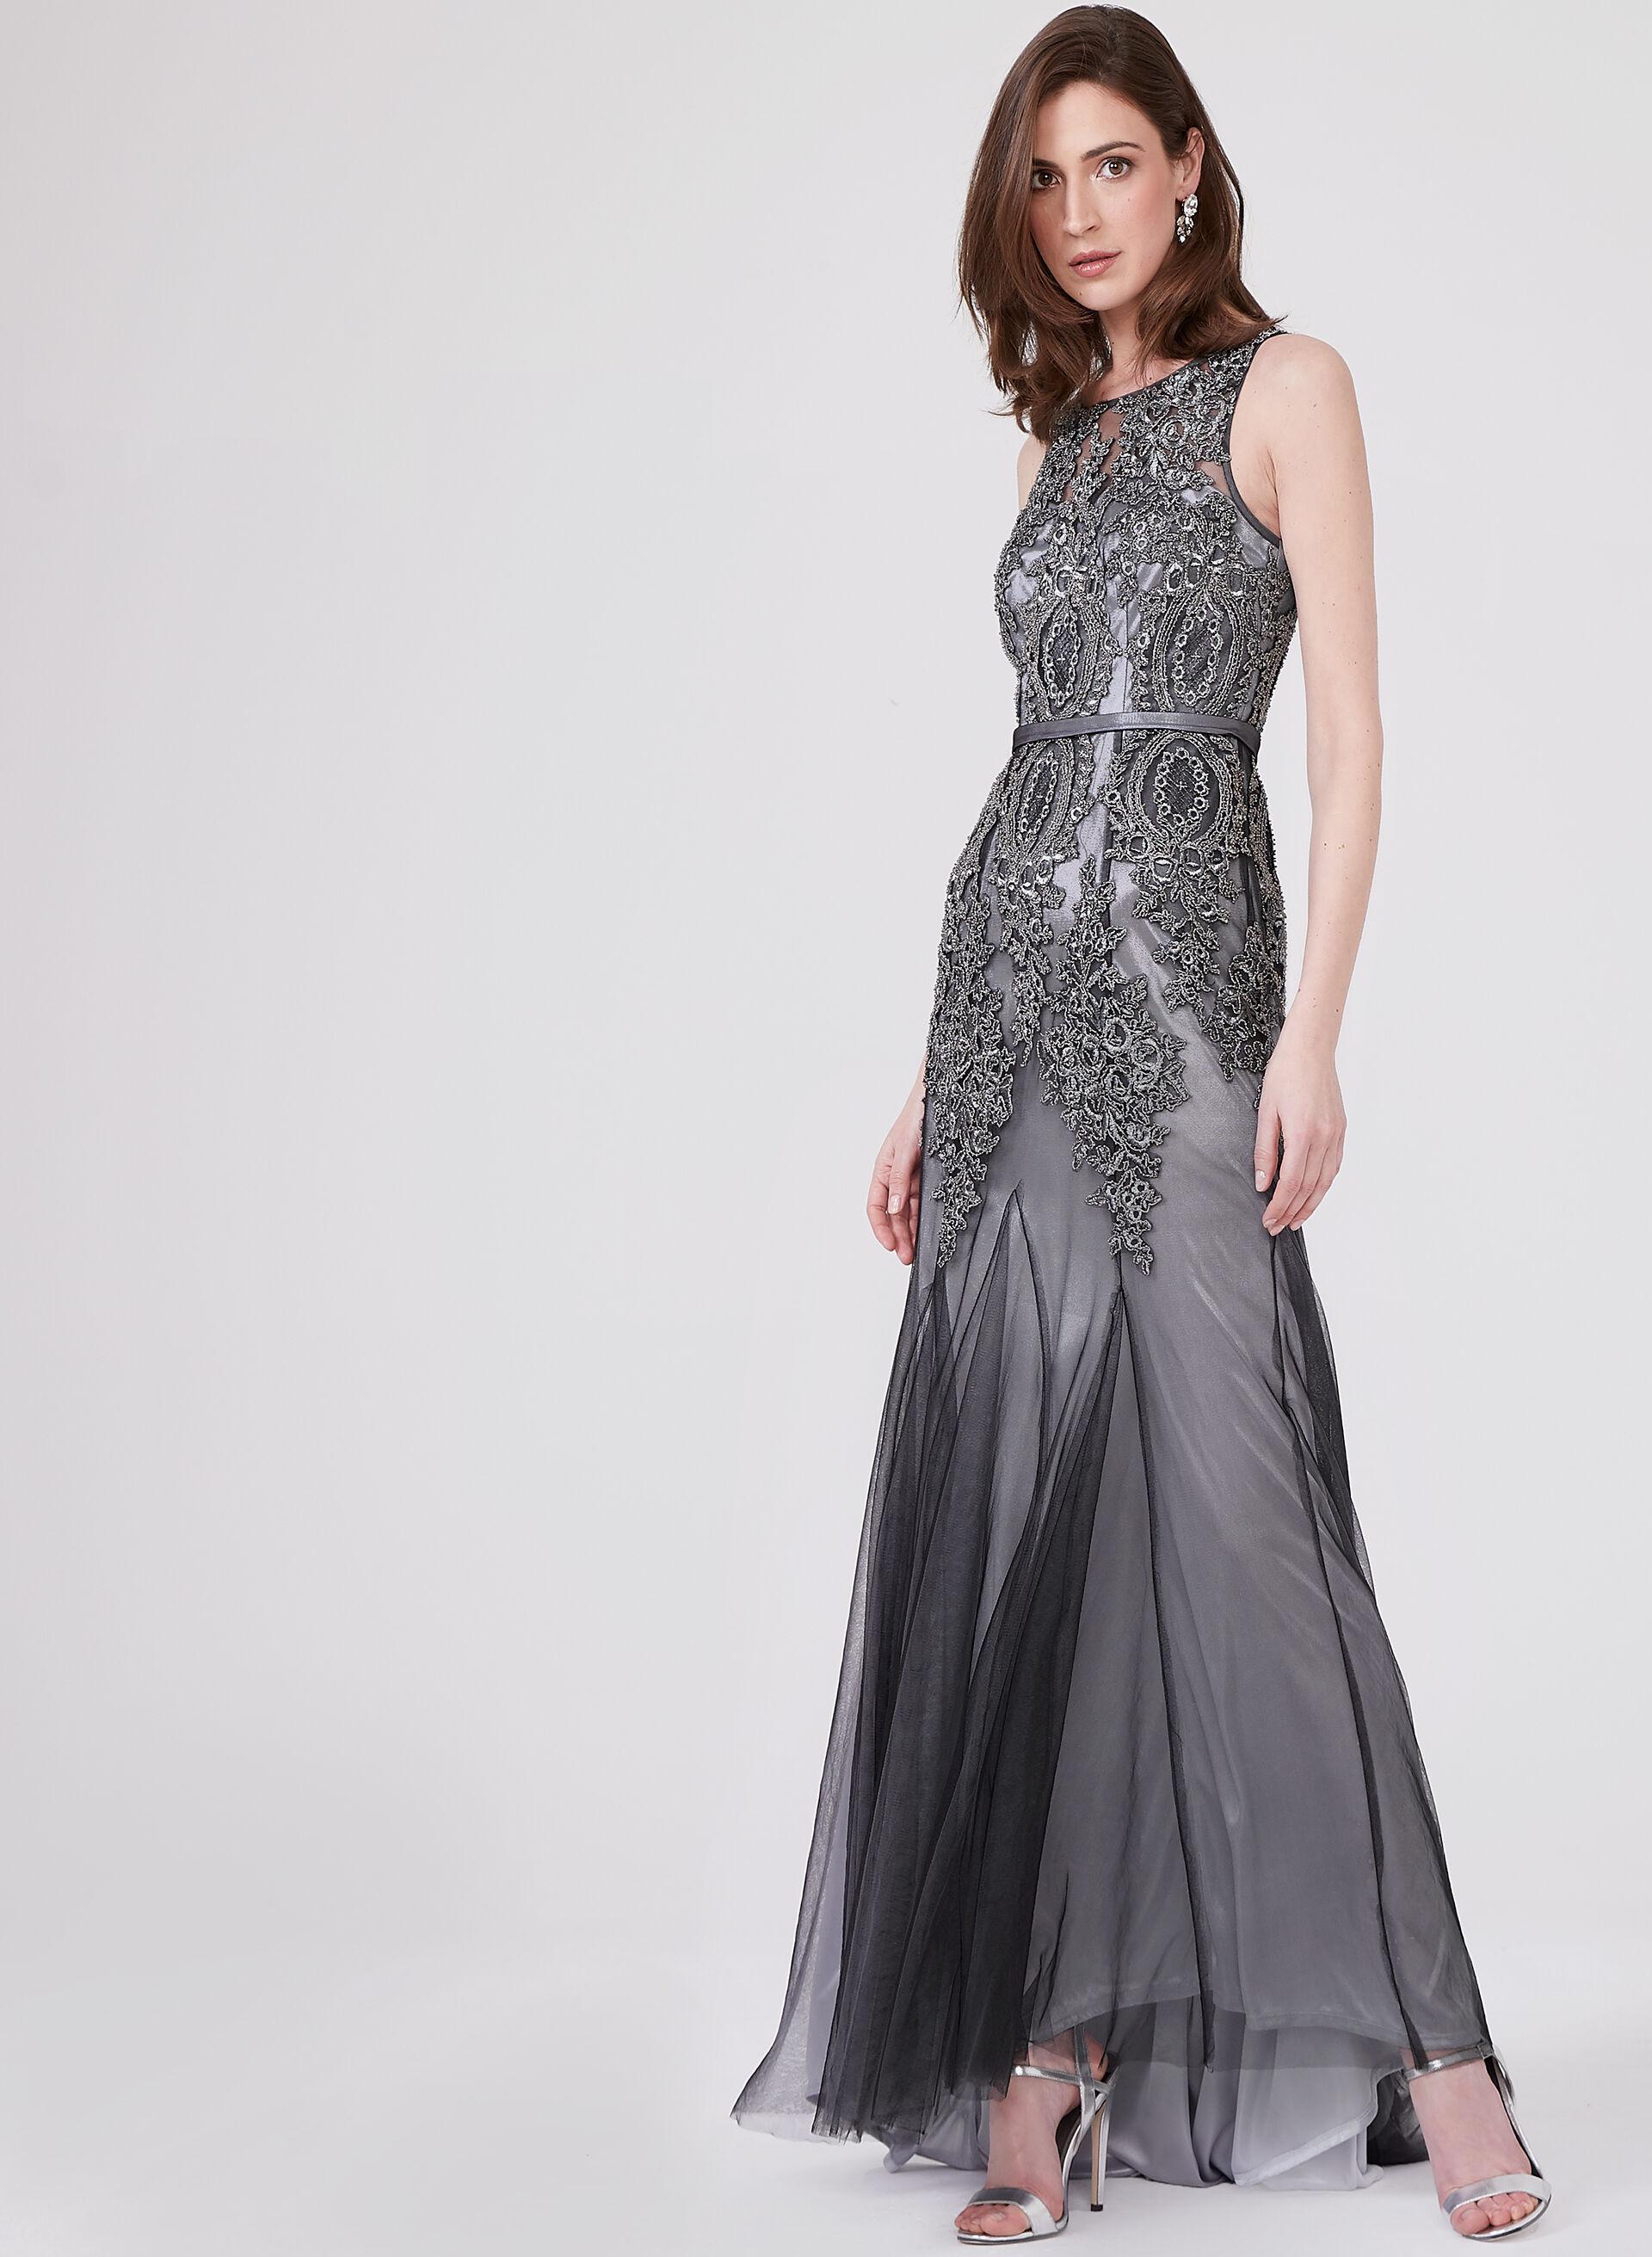 Bra to wear with lace back dress